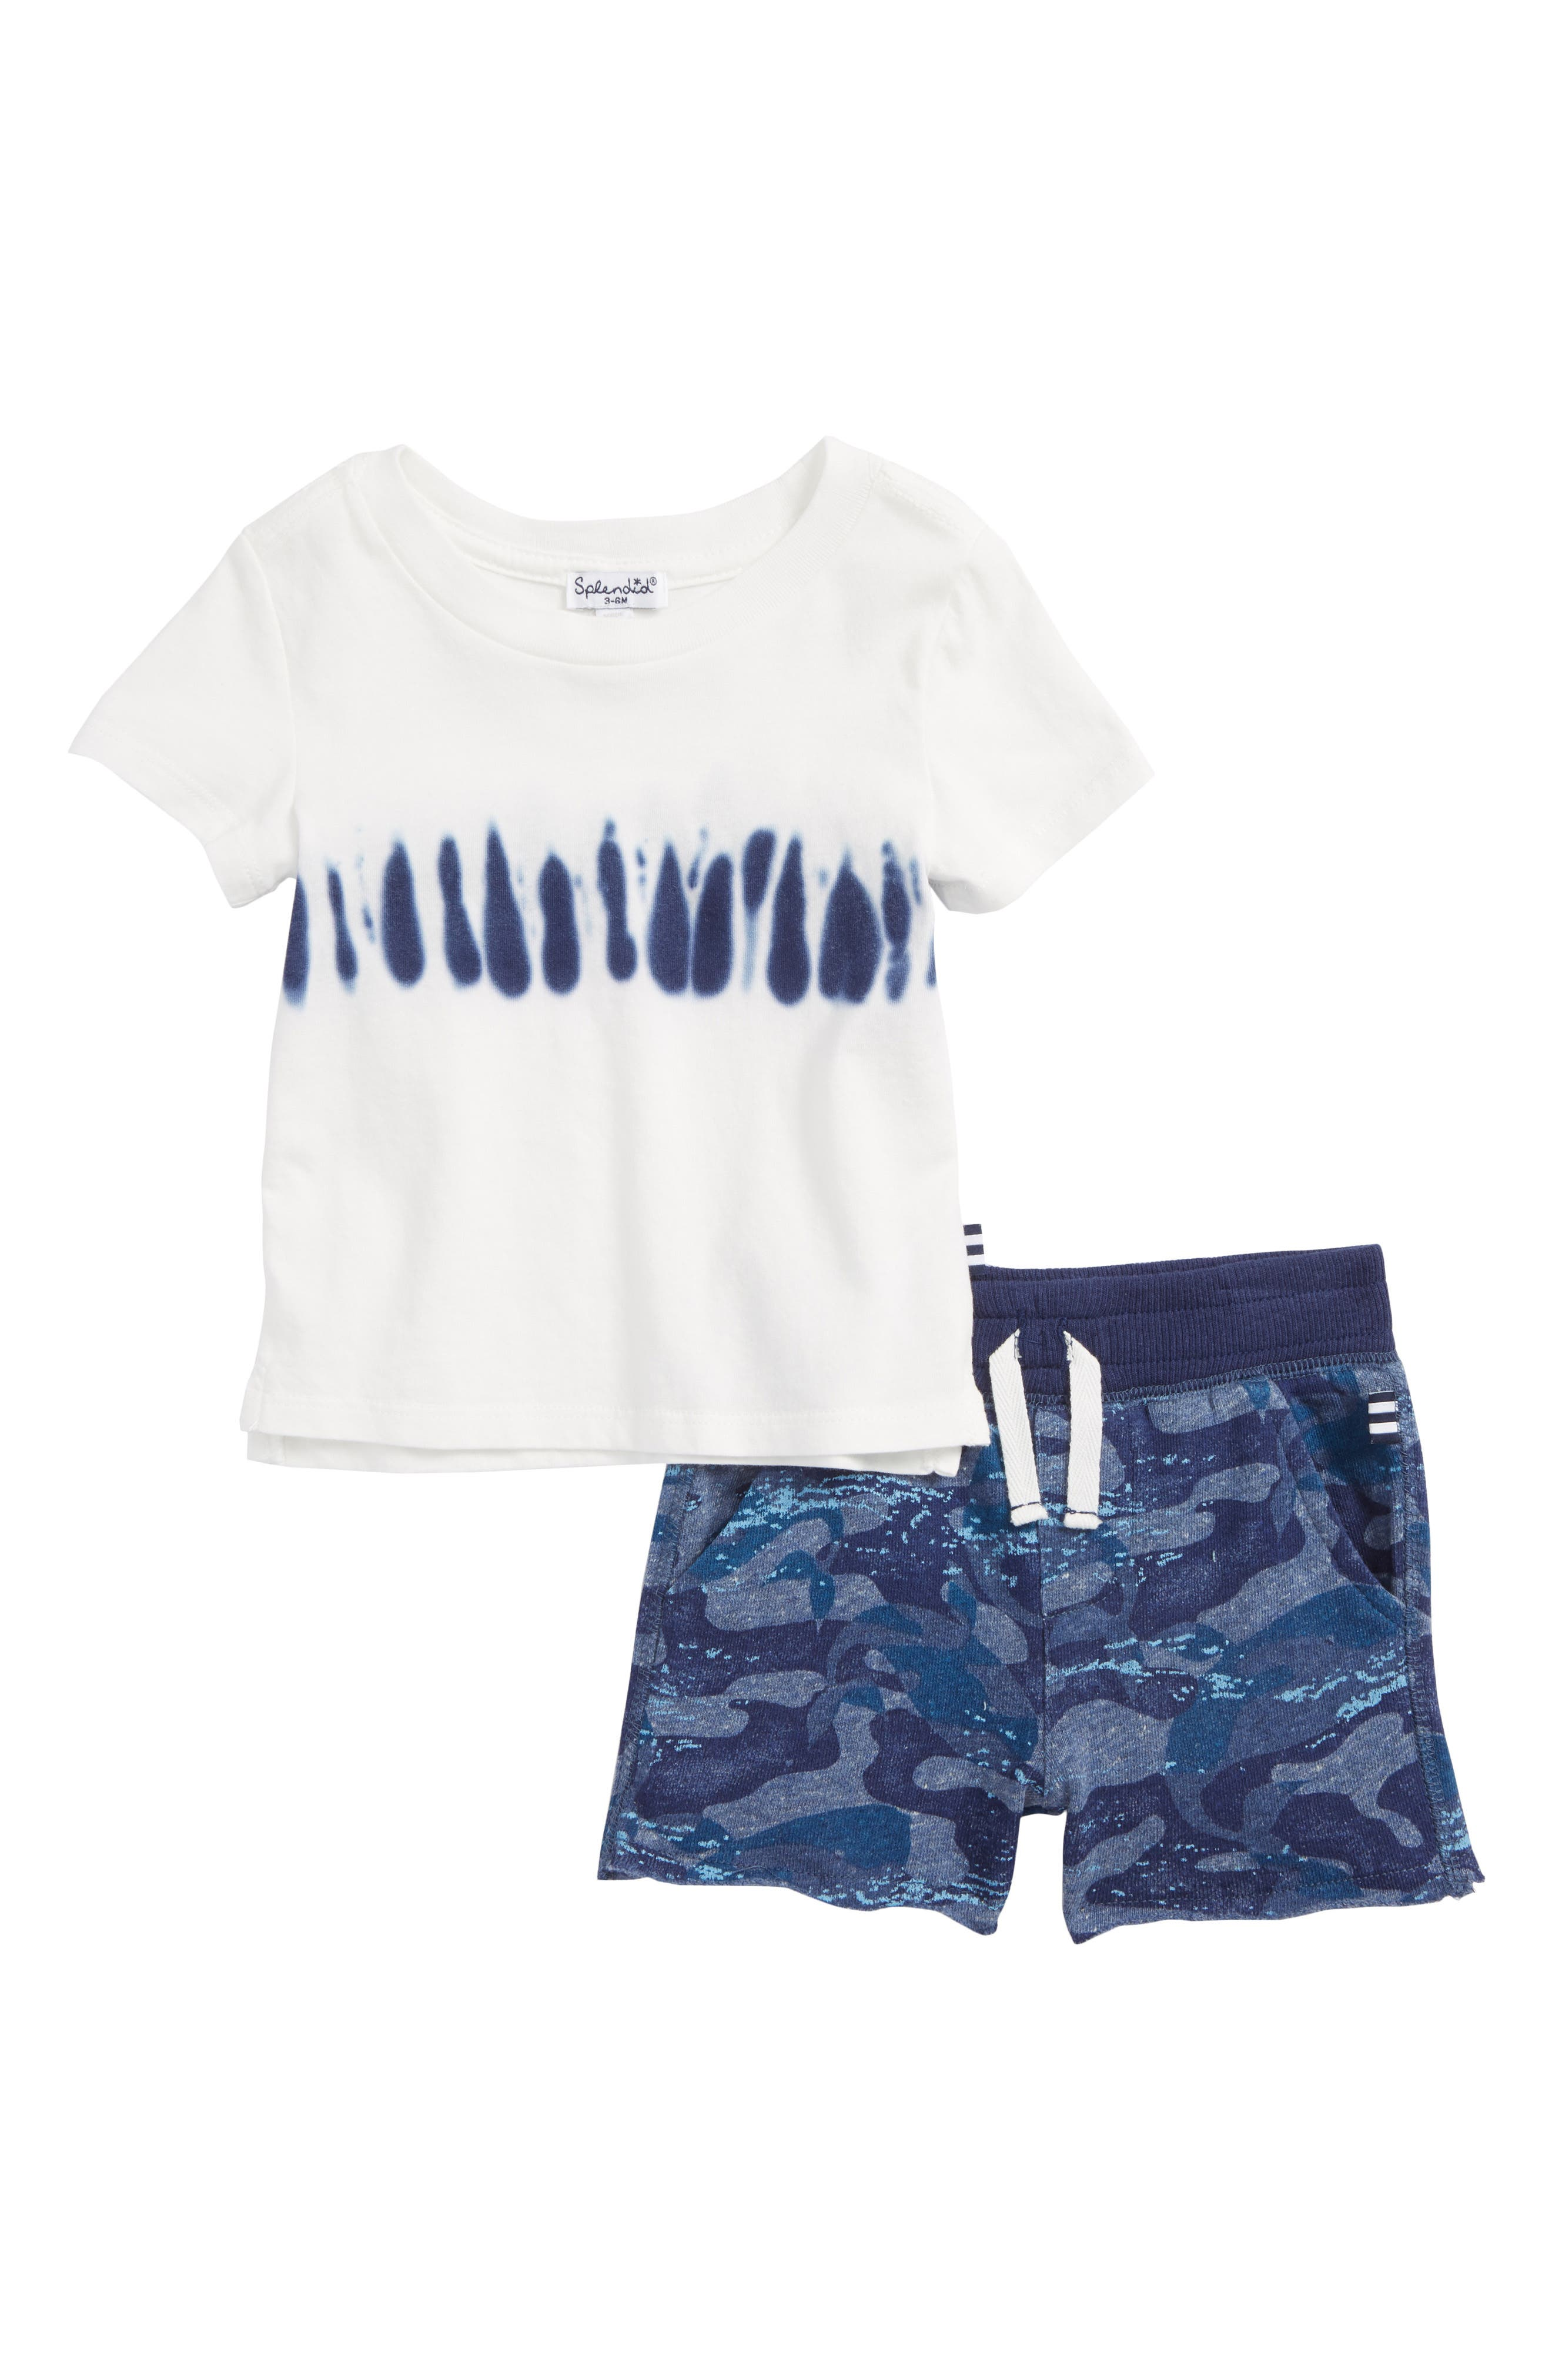 Whale Print T-Shirt & Shorts Set,                             Main thumbnail 1, color,                             400